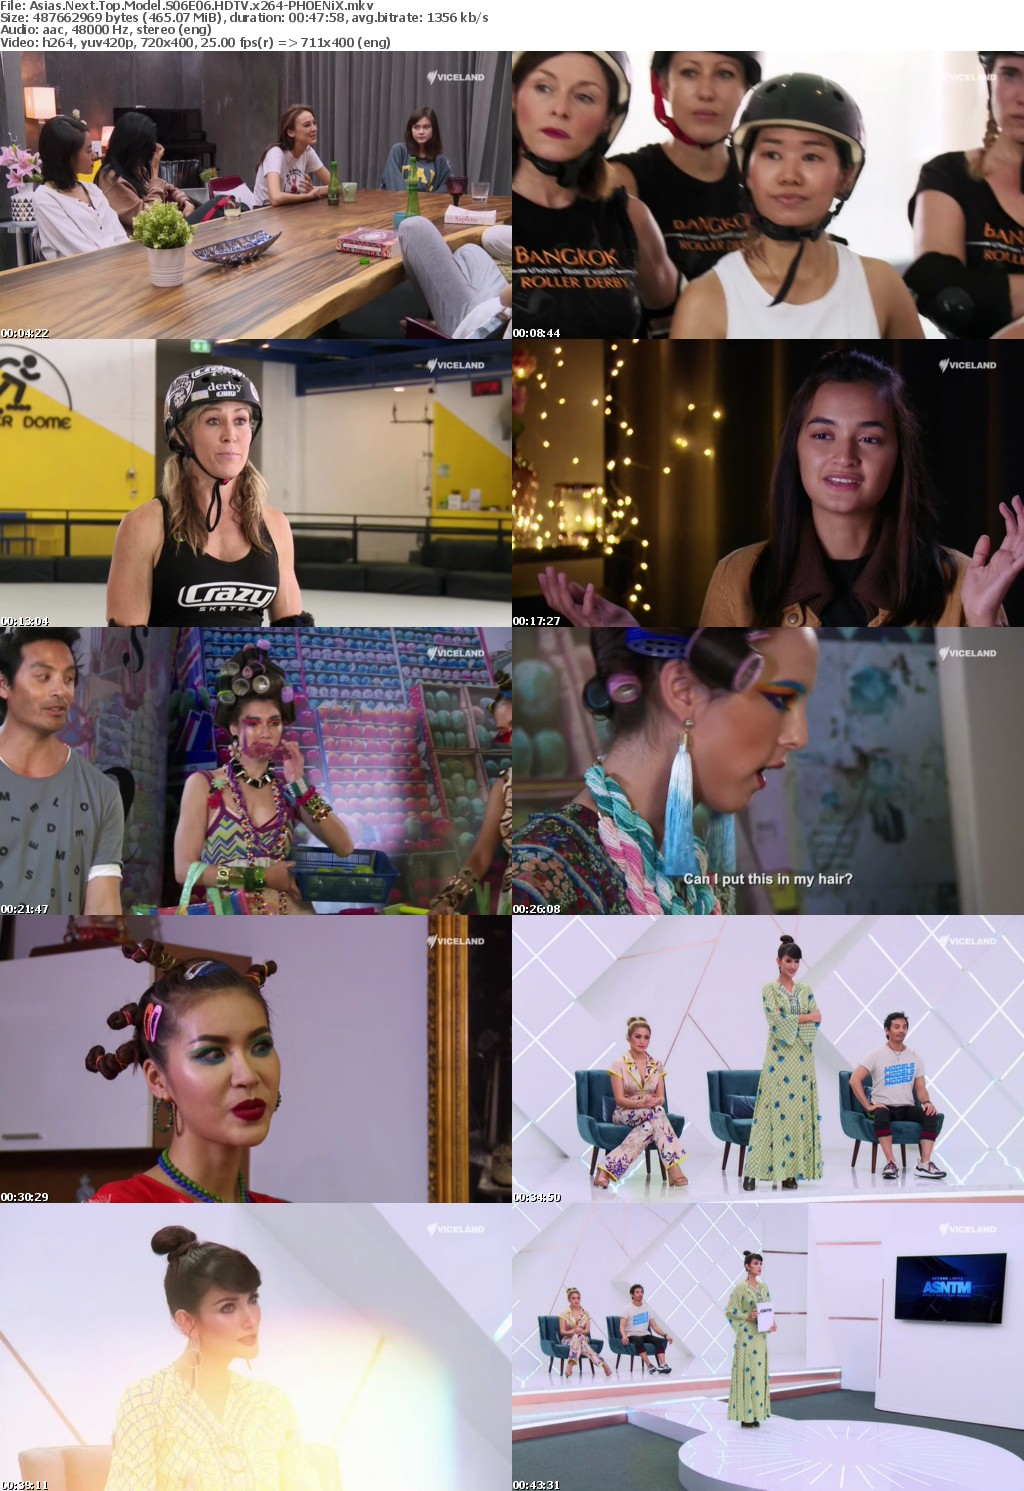 Asias Next Top Model S06E06 HDTV x264-PHOENiX